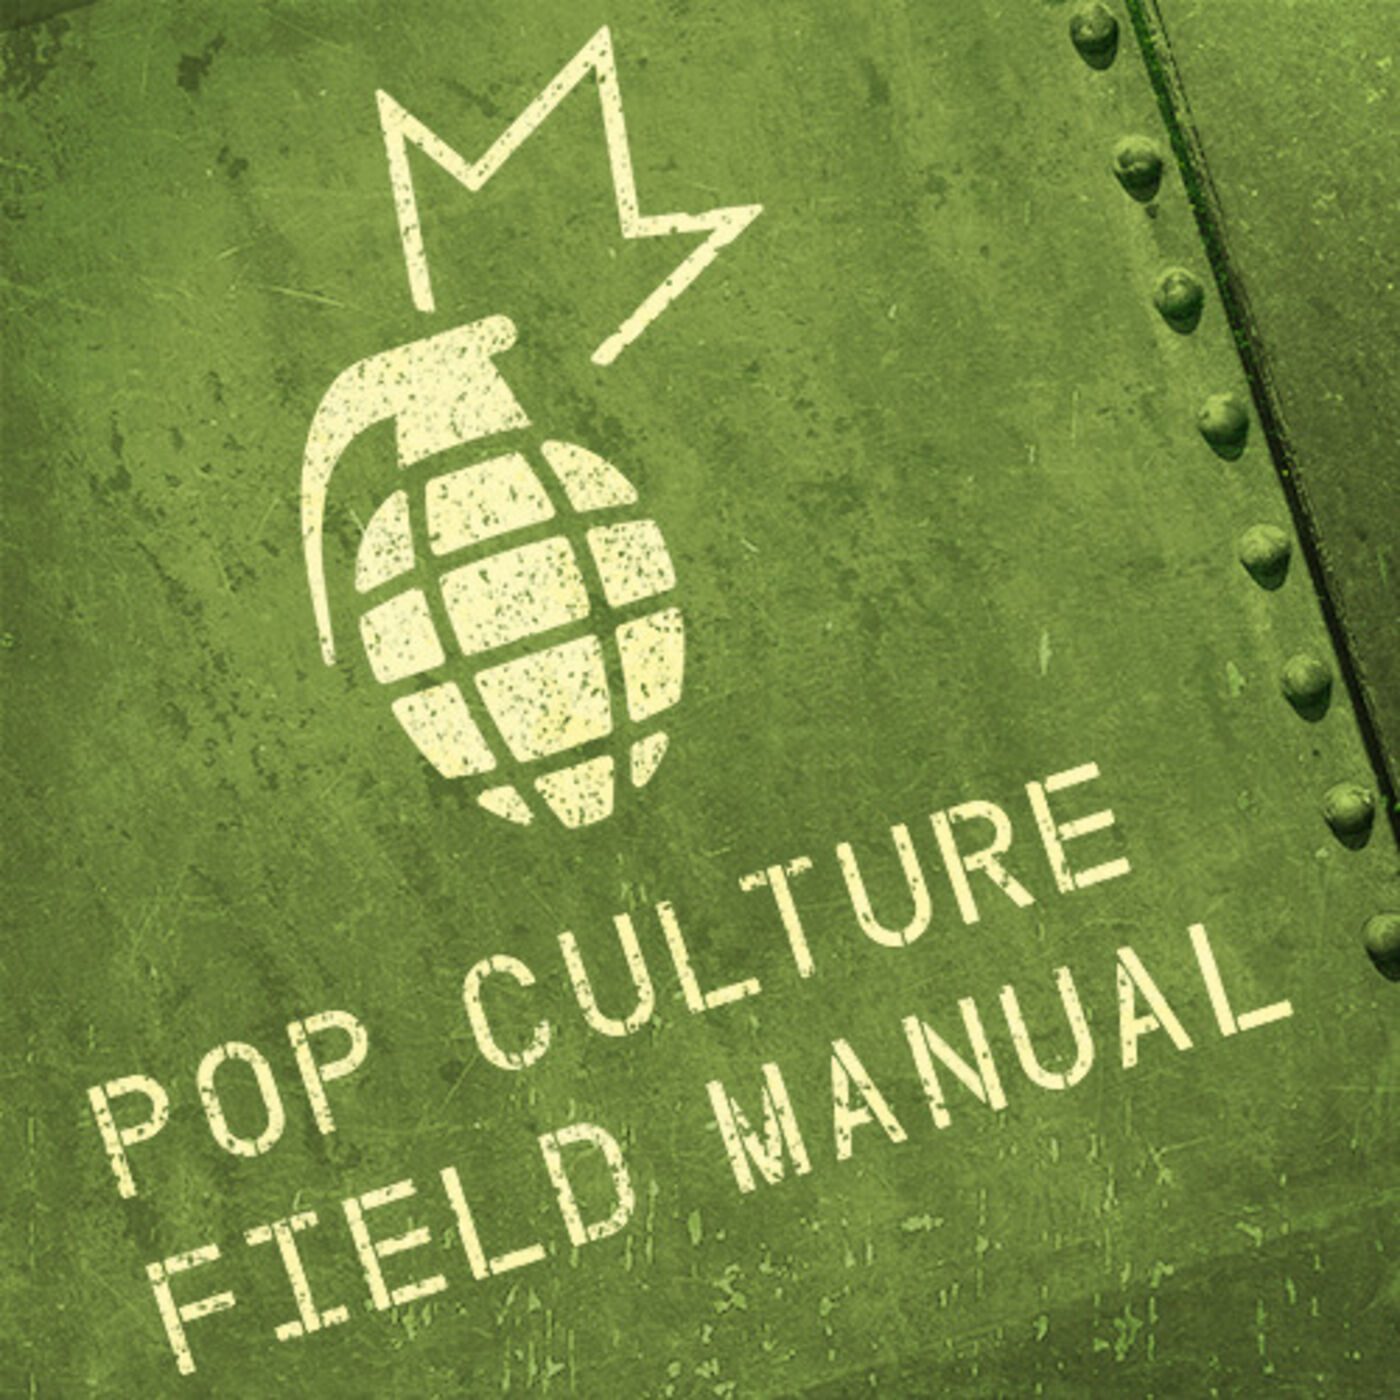 Pop Culture Field Manual